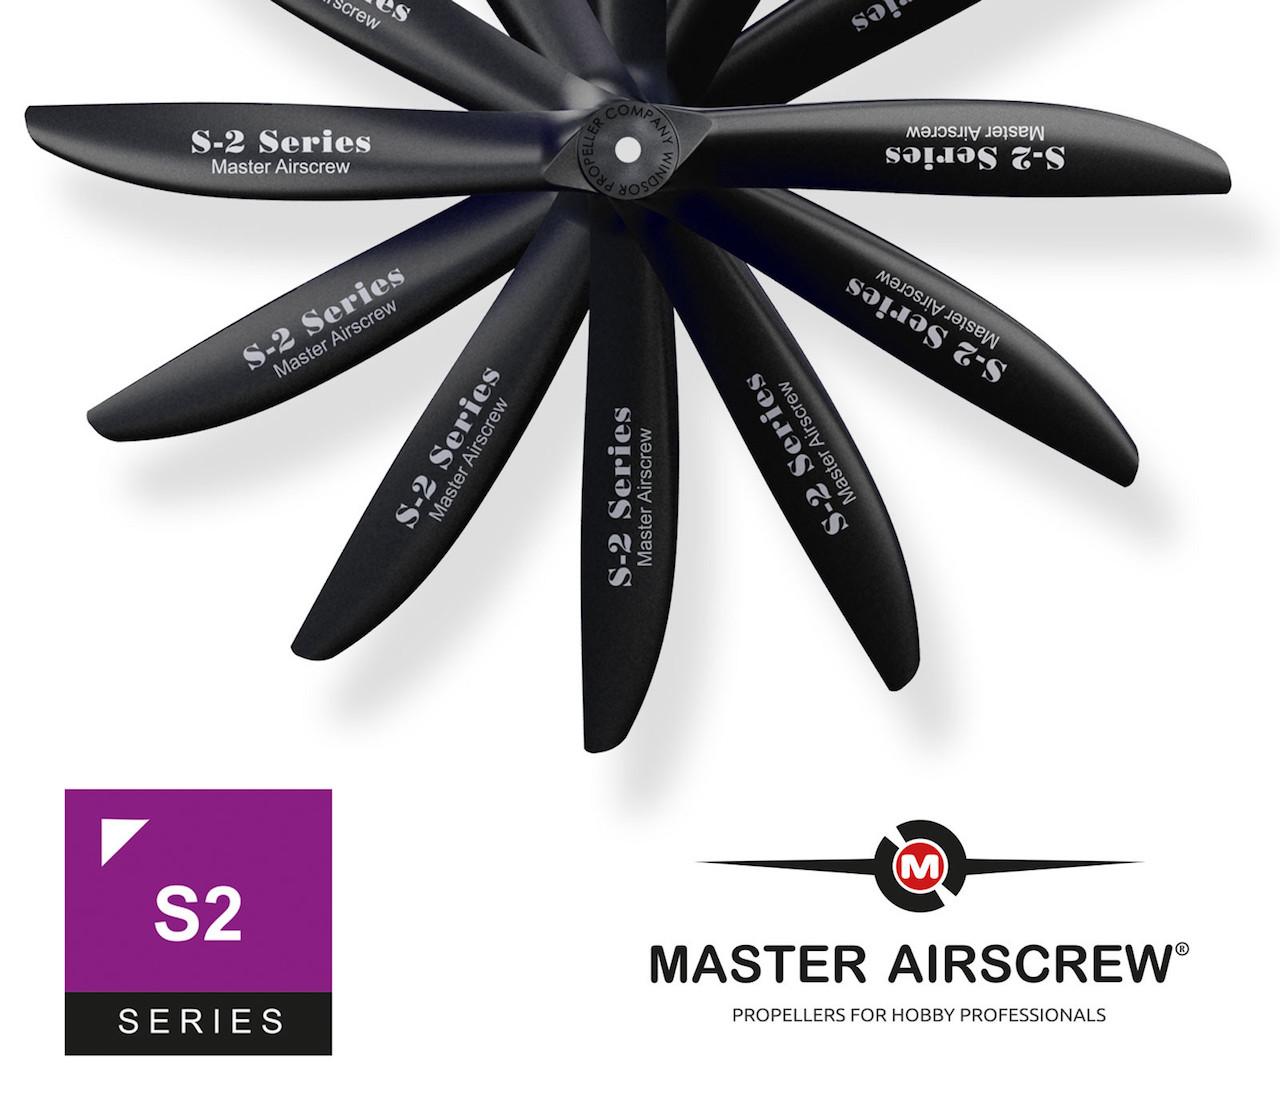 Master Airscrew Scimitar S2 Series